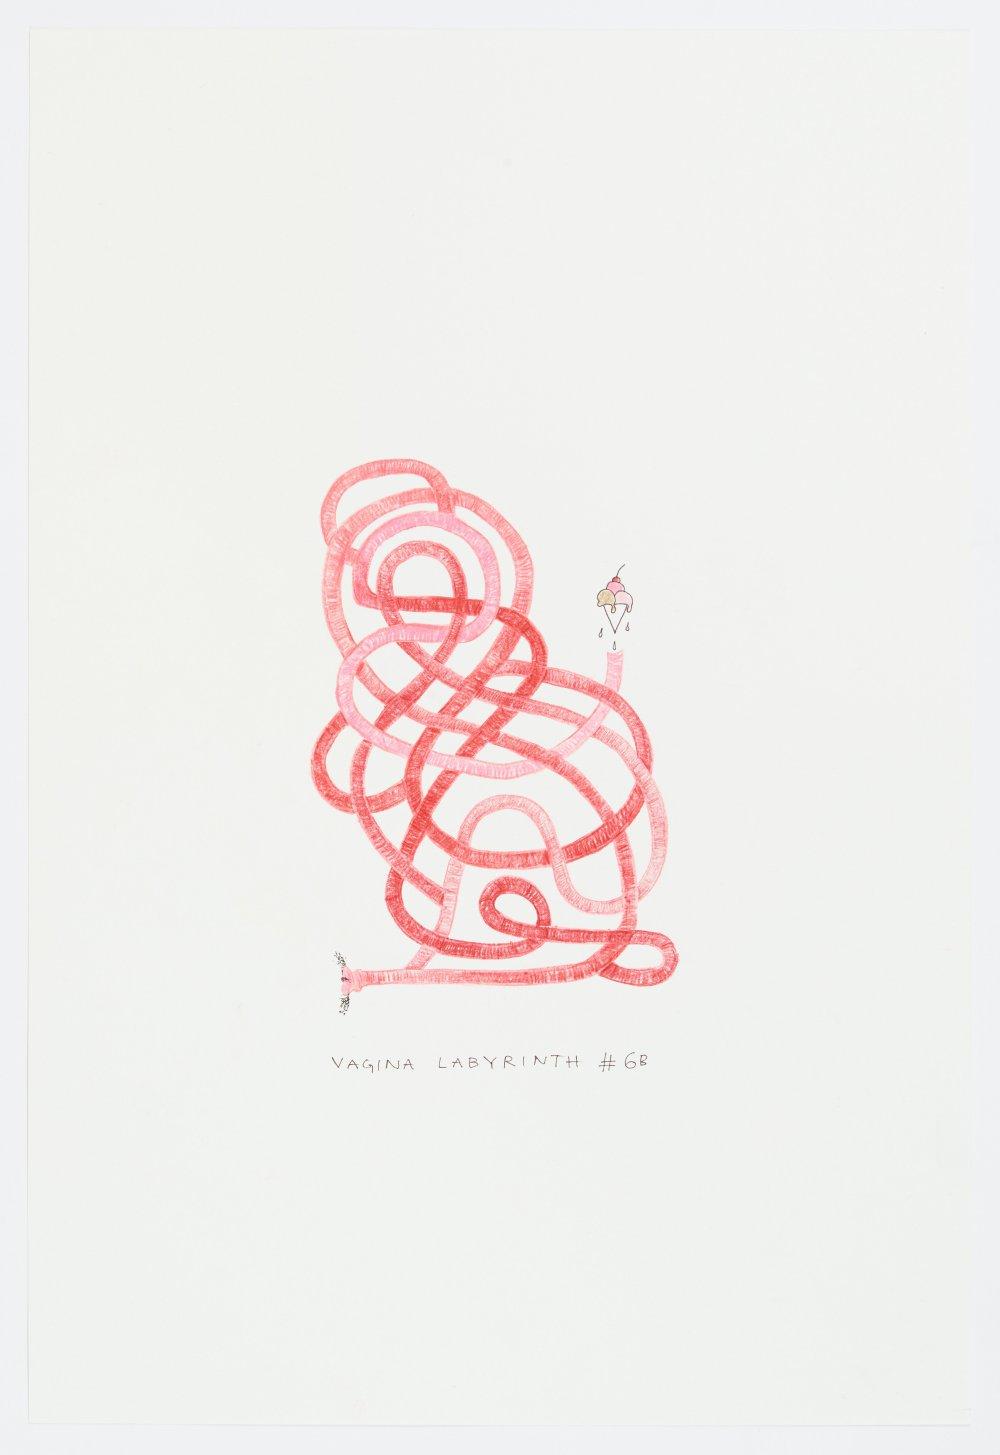 Vagina Labyrinth #6B